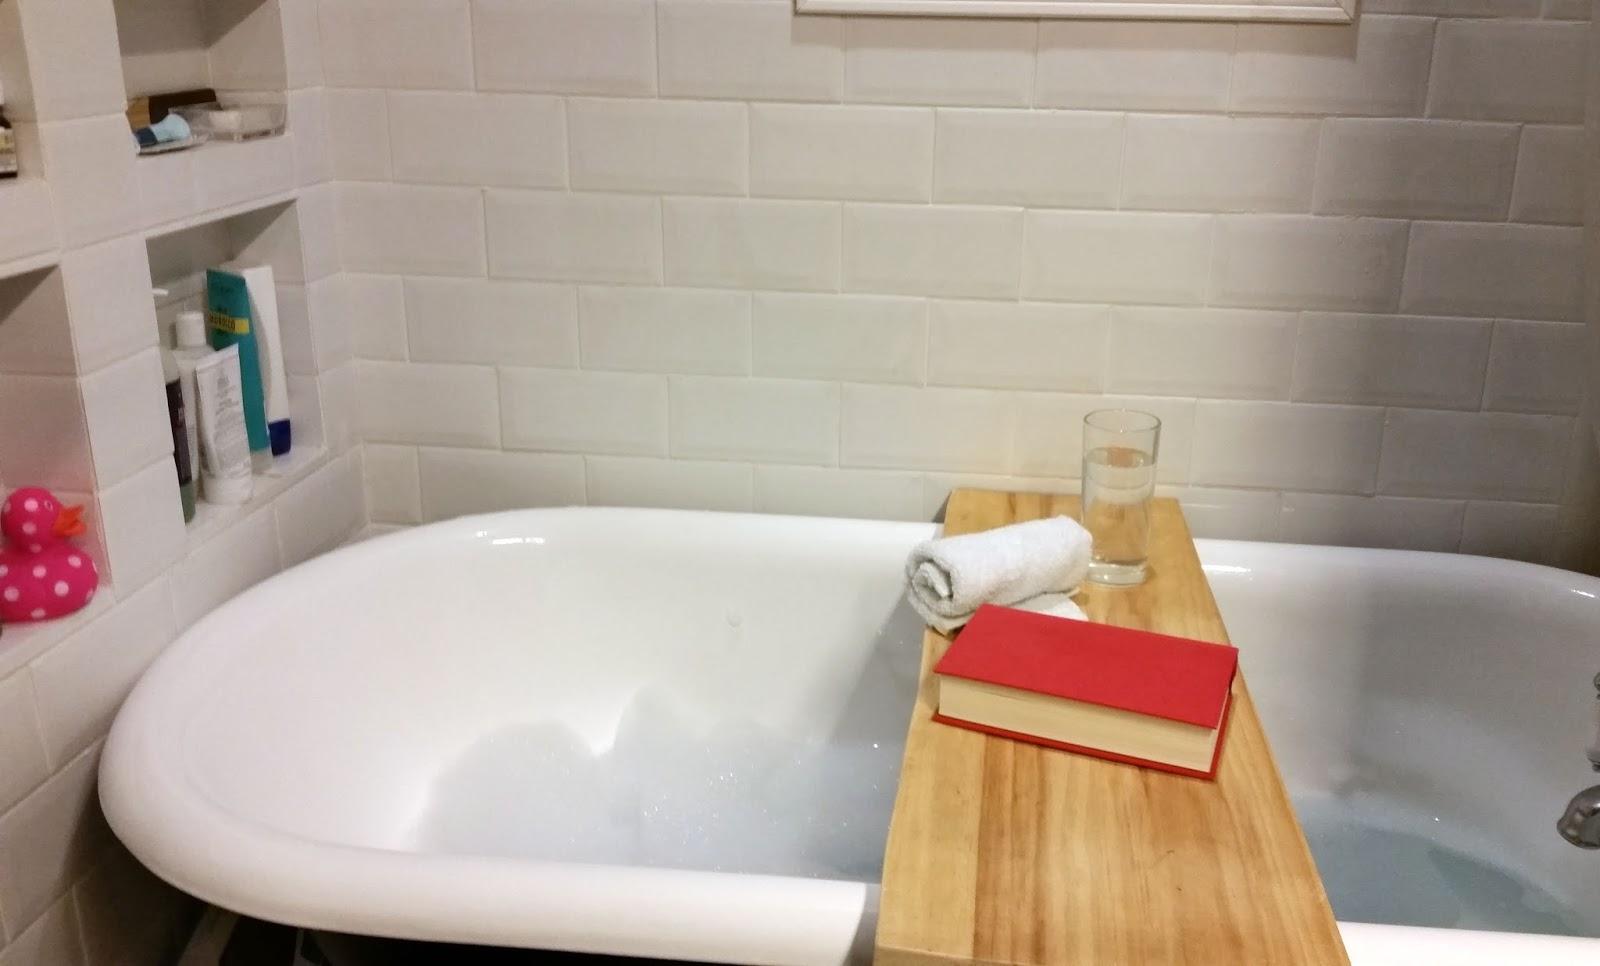 Fresh Coat of Paint: DIY Bath Table